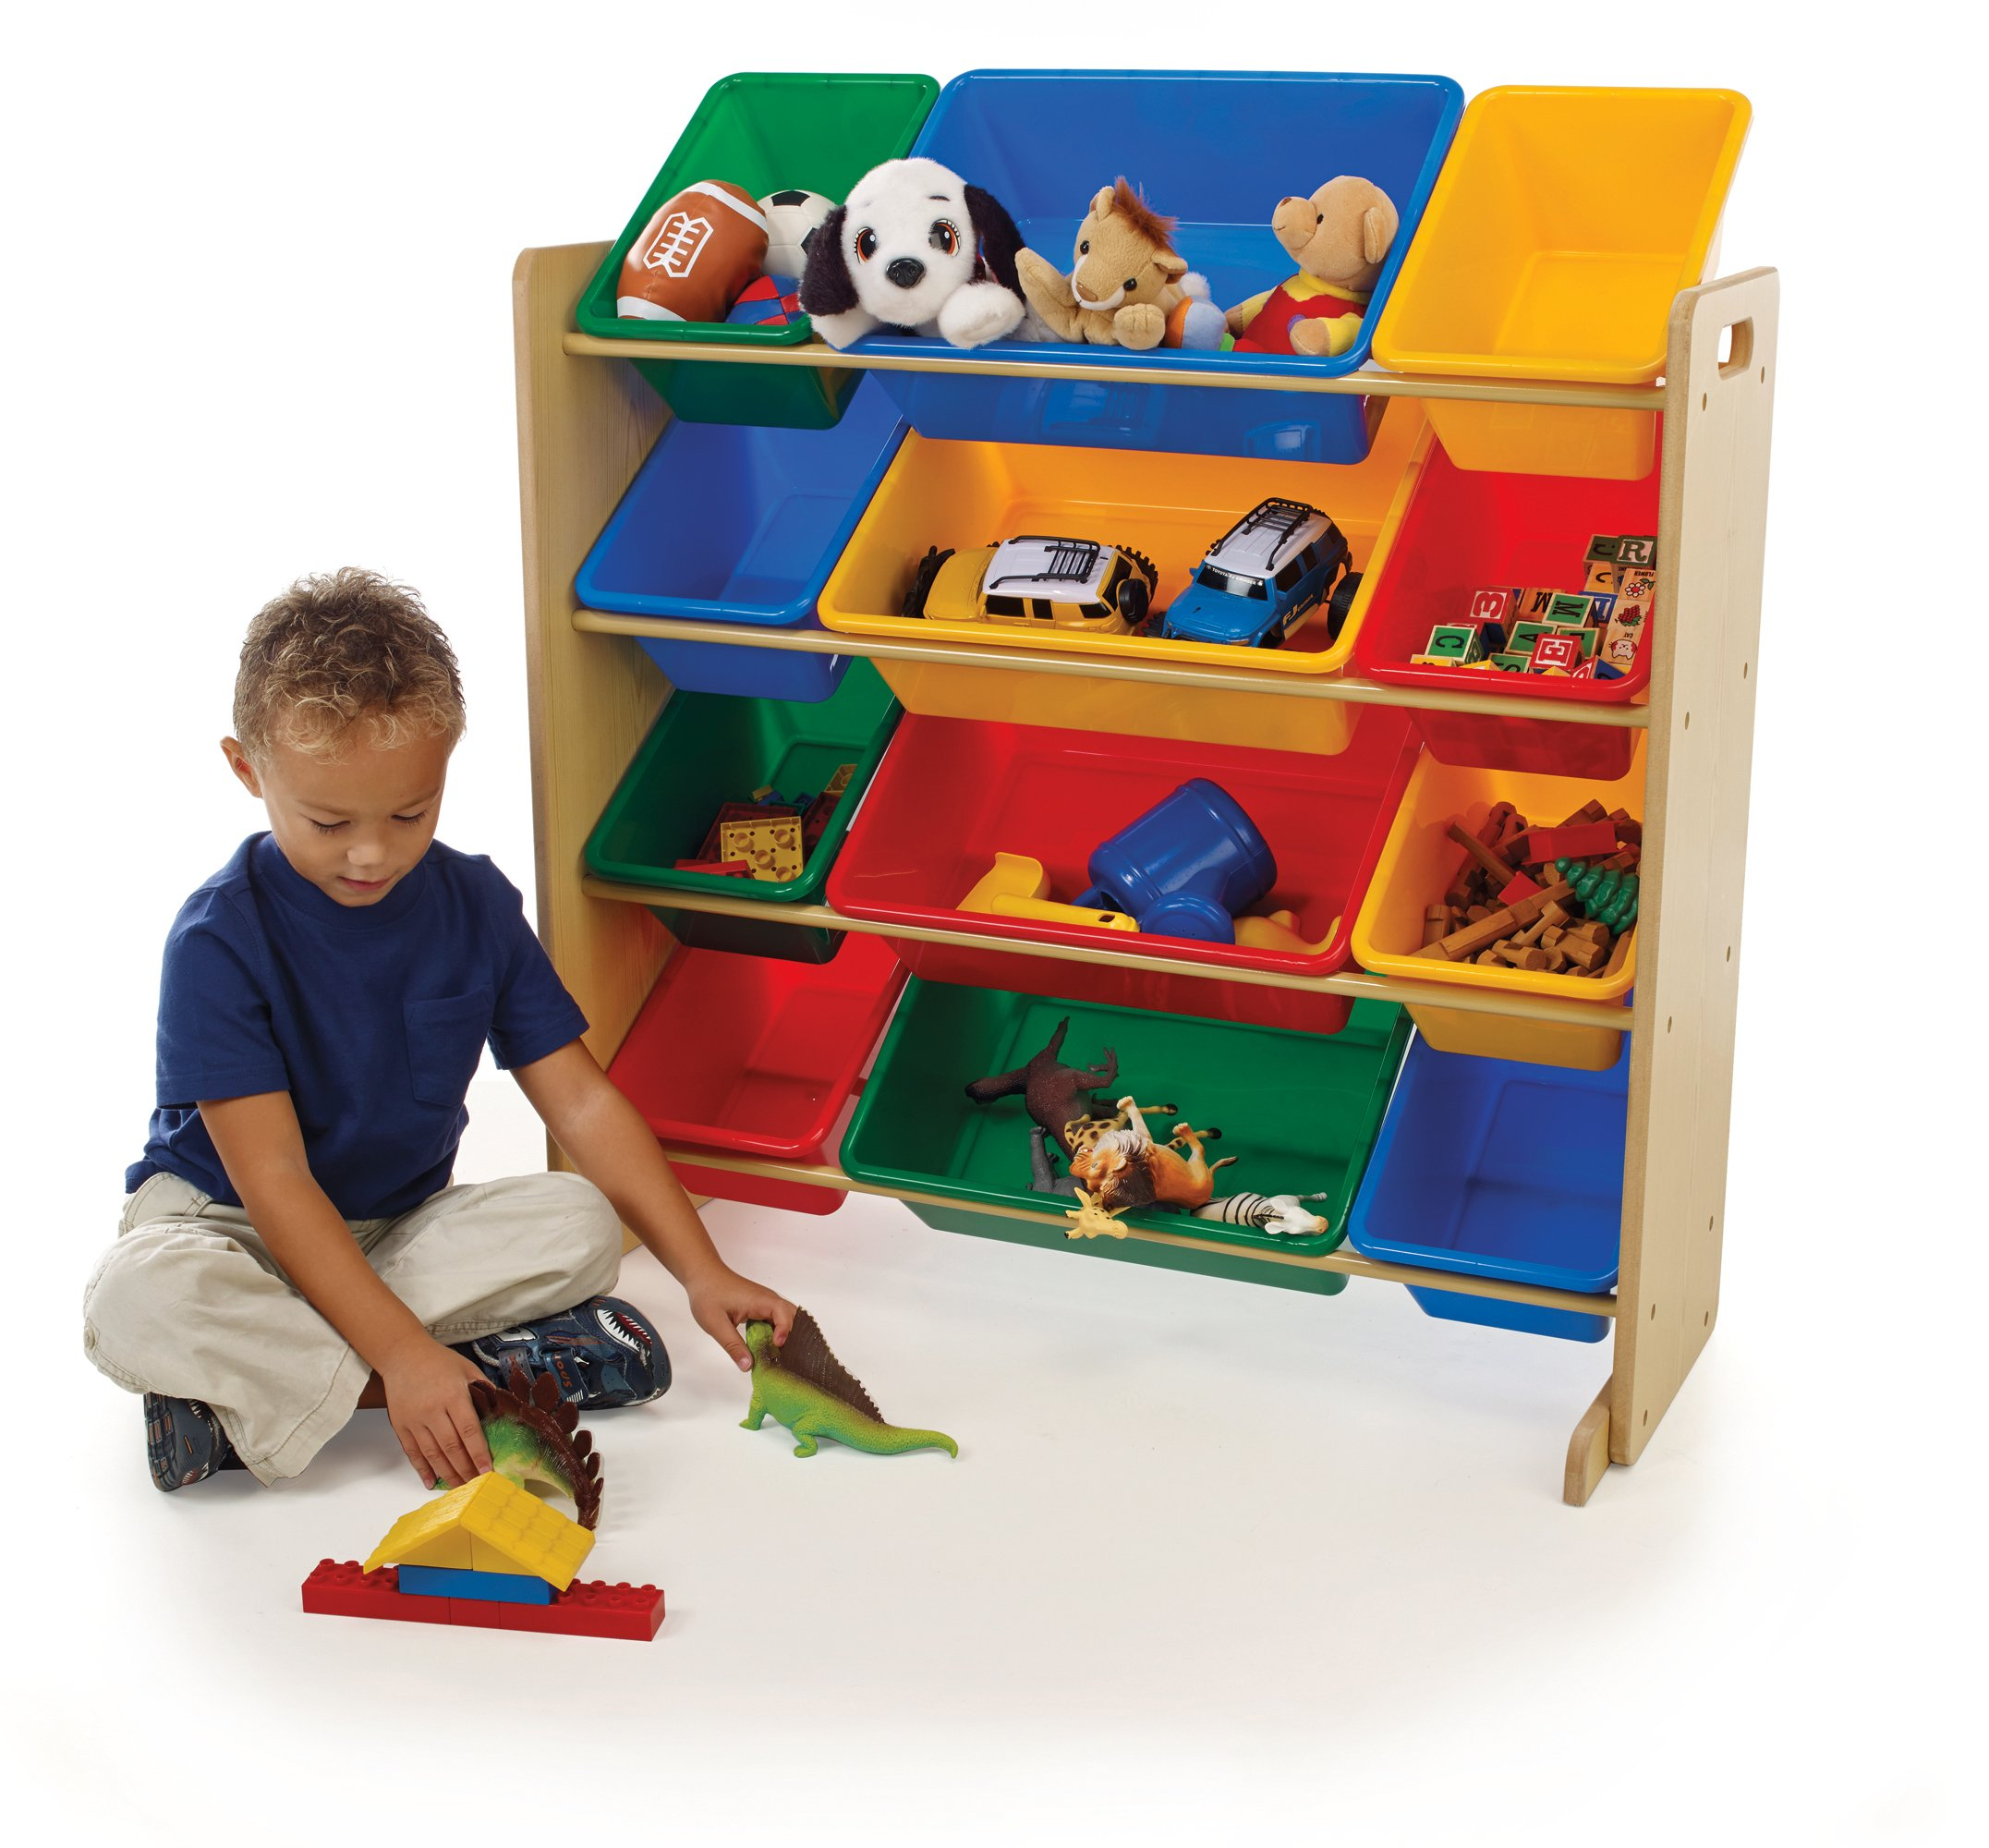 tot tutors kids toy organizer with storage bins primary. Black Bedroom Furniture Sets. Home Design Ideas